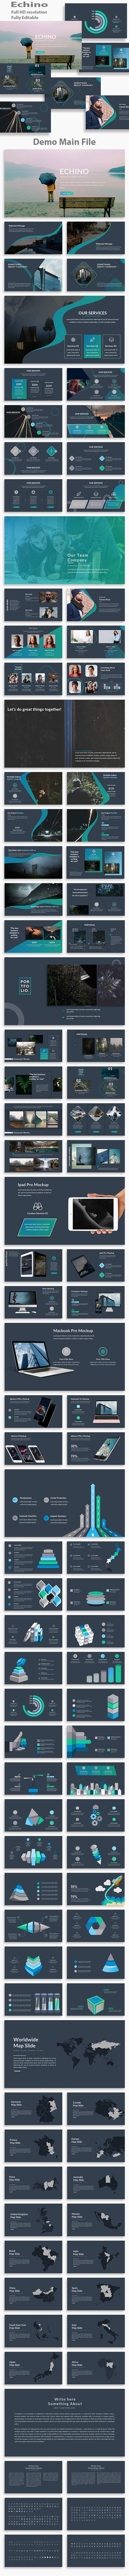 Echino Multipurpose Google Slide template - Google Slides Presentation Templates